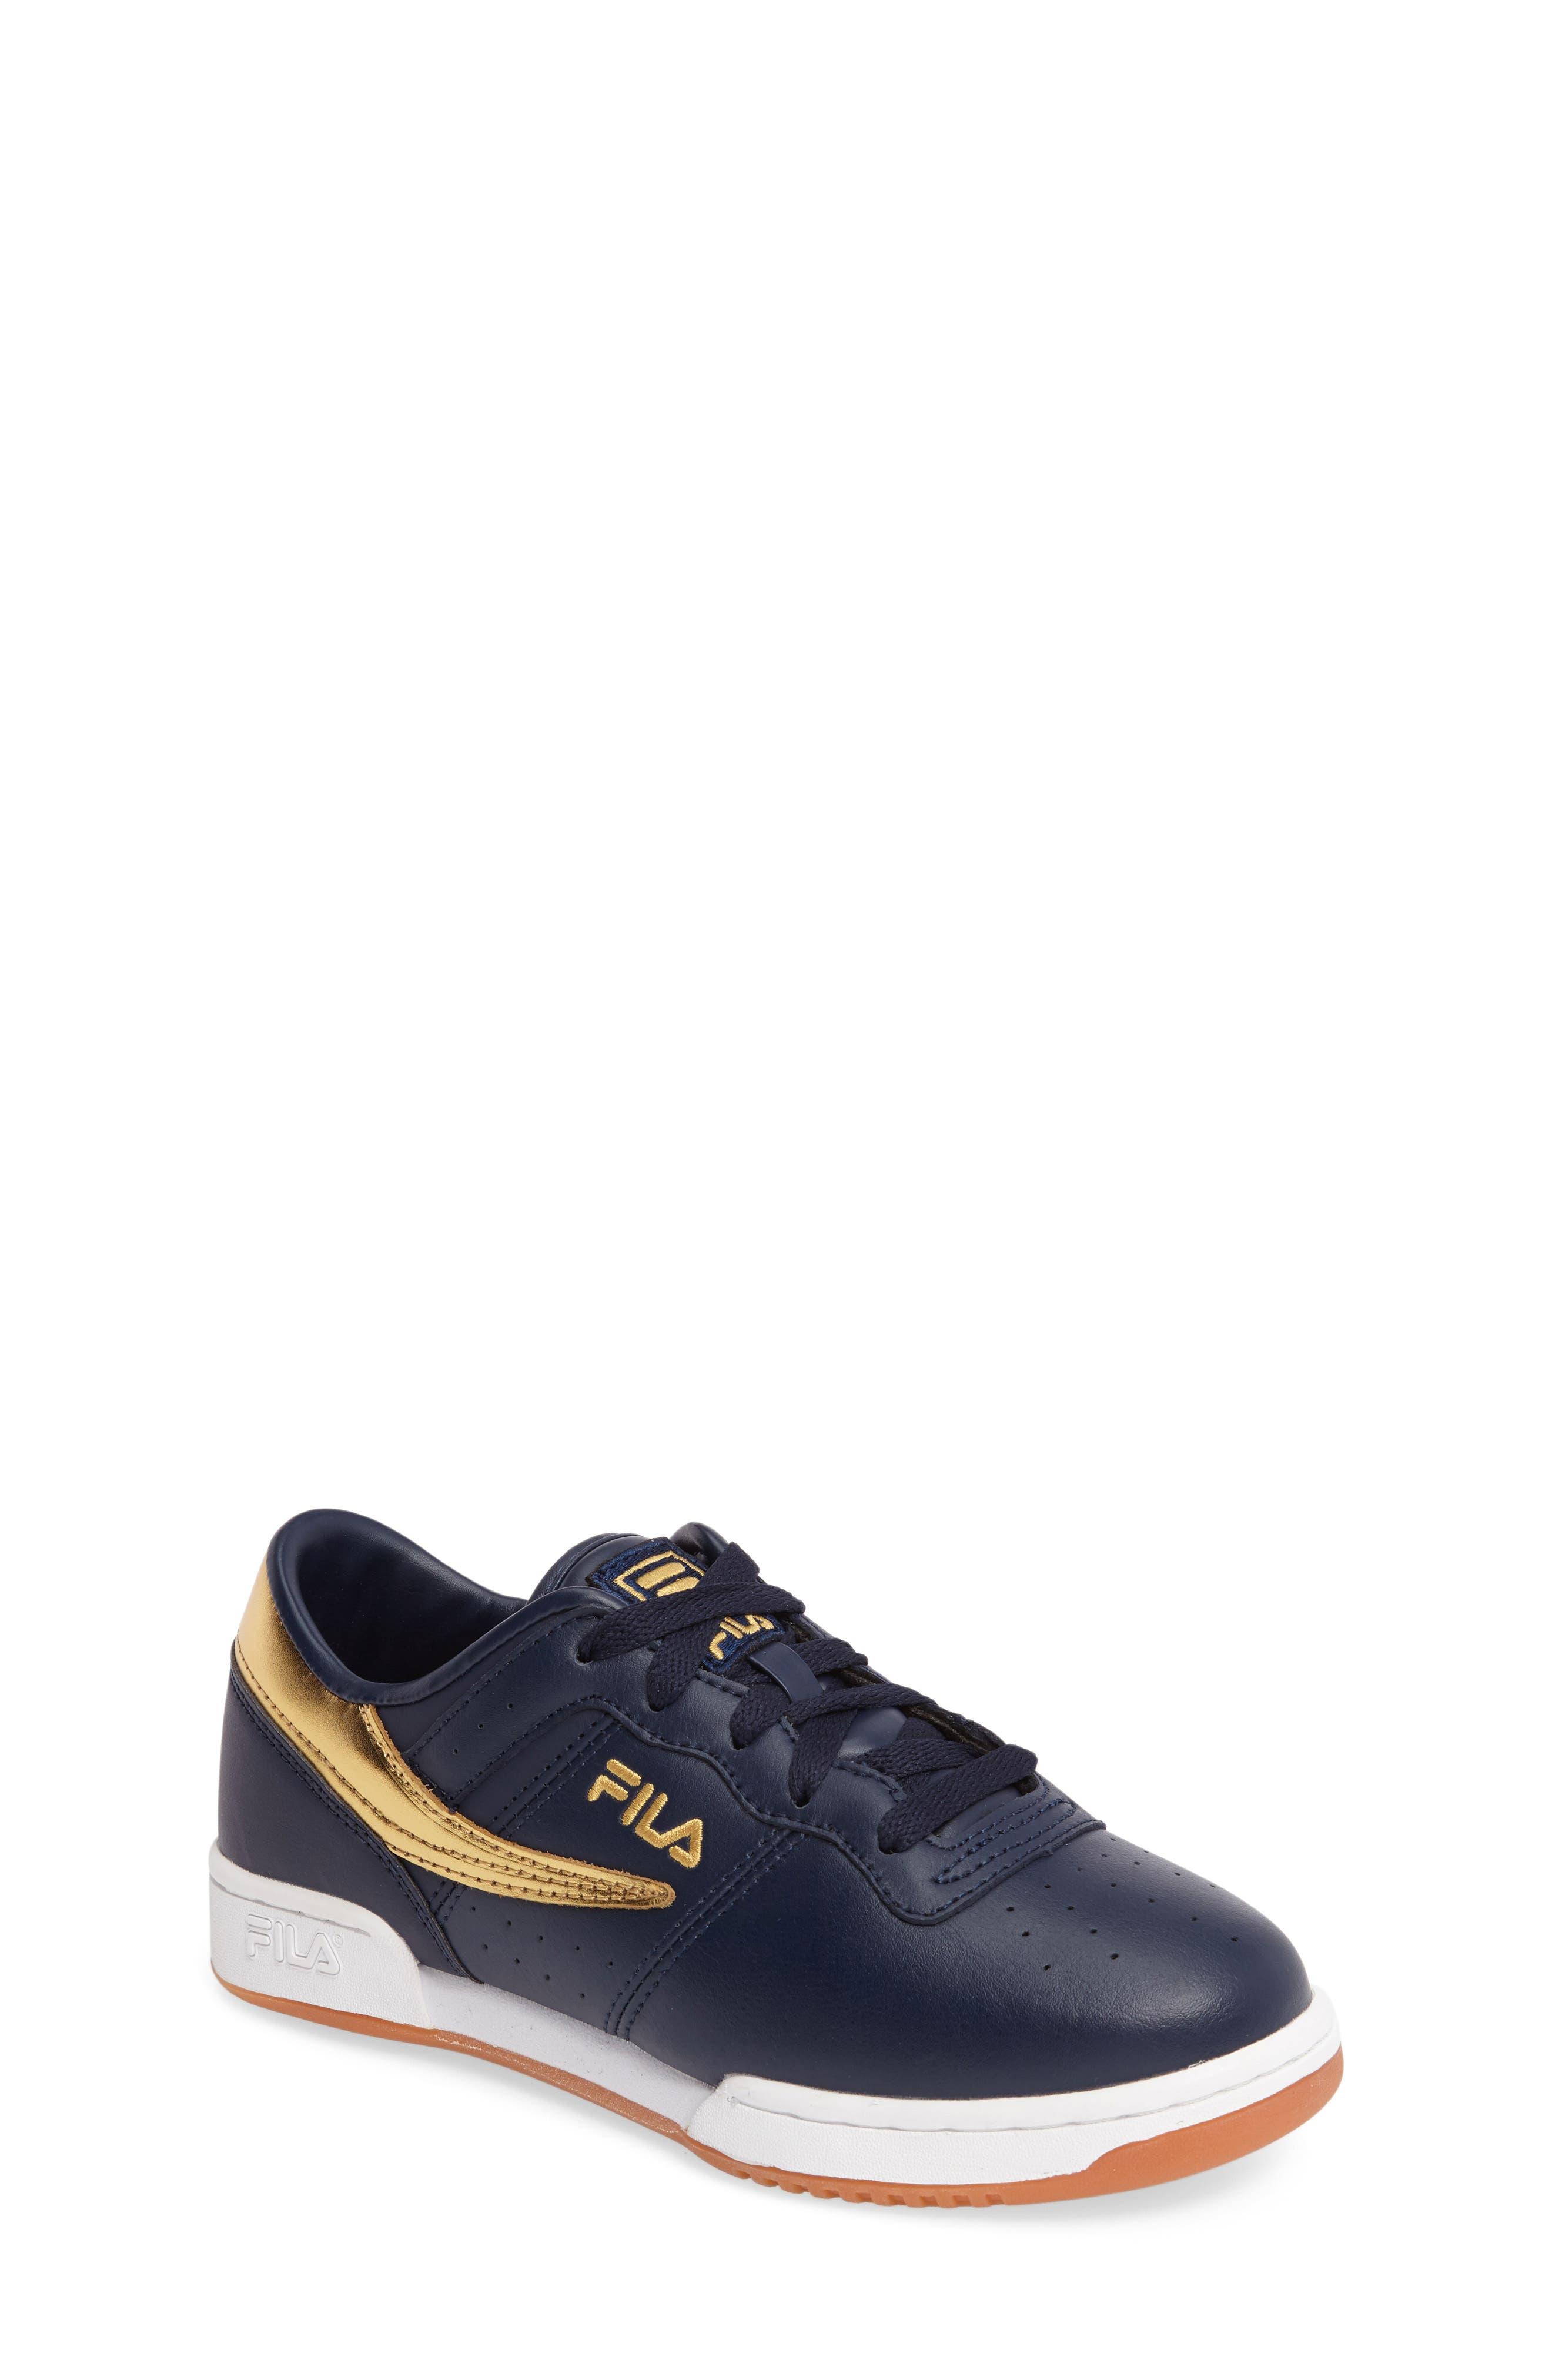 Heritage Sneaker,                             Main thumbnail 1, color,                             001